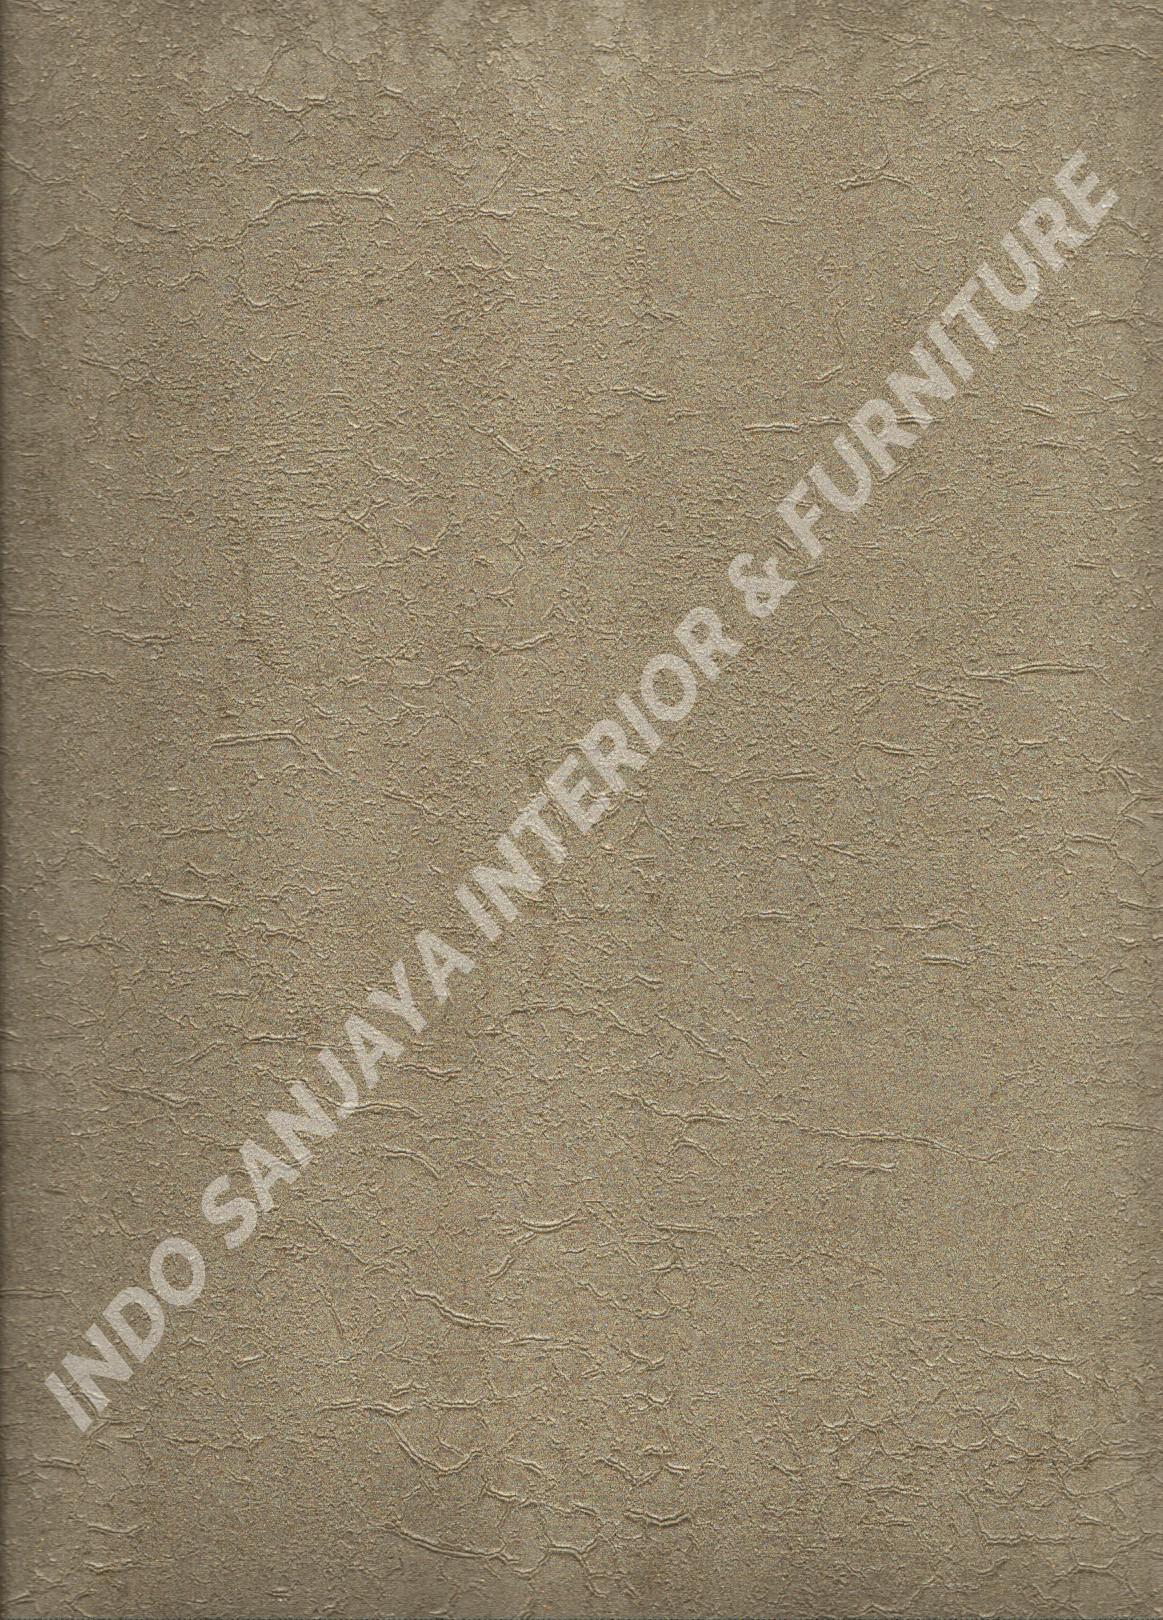 wallpaper   Wallpaper Minimalis Polos HD-9-15:HD-9-15 corak  warna